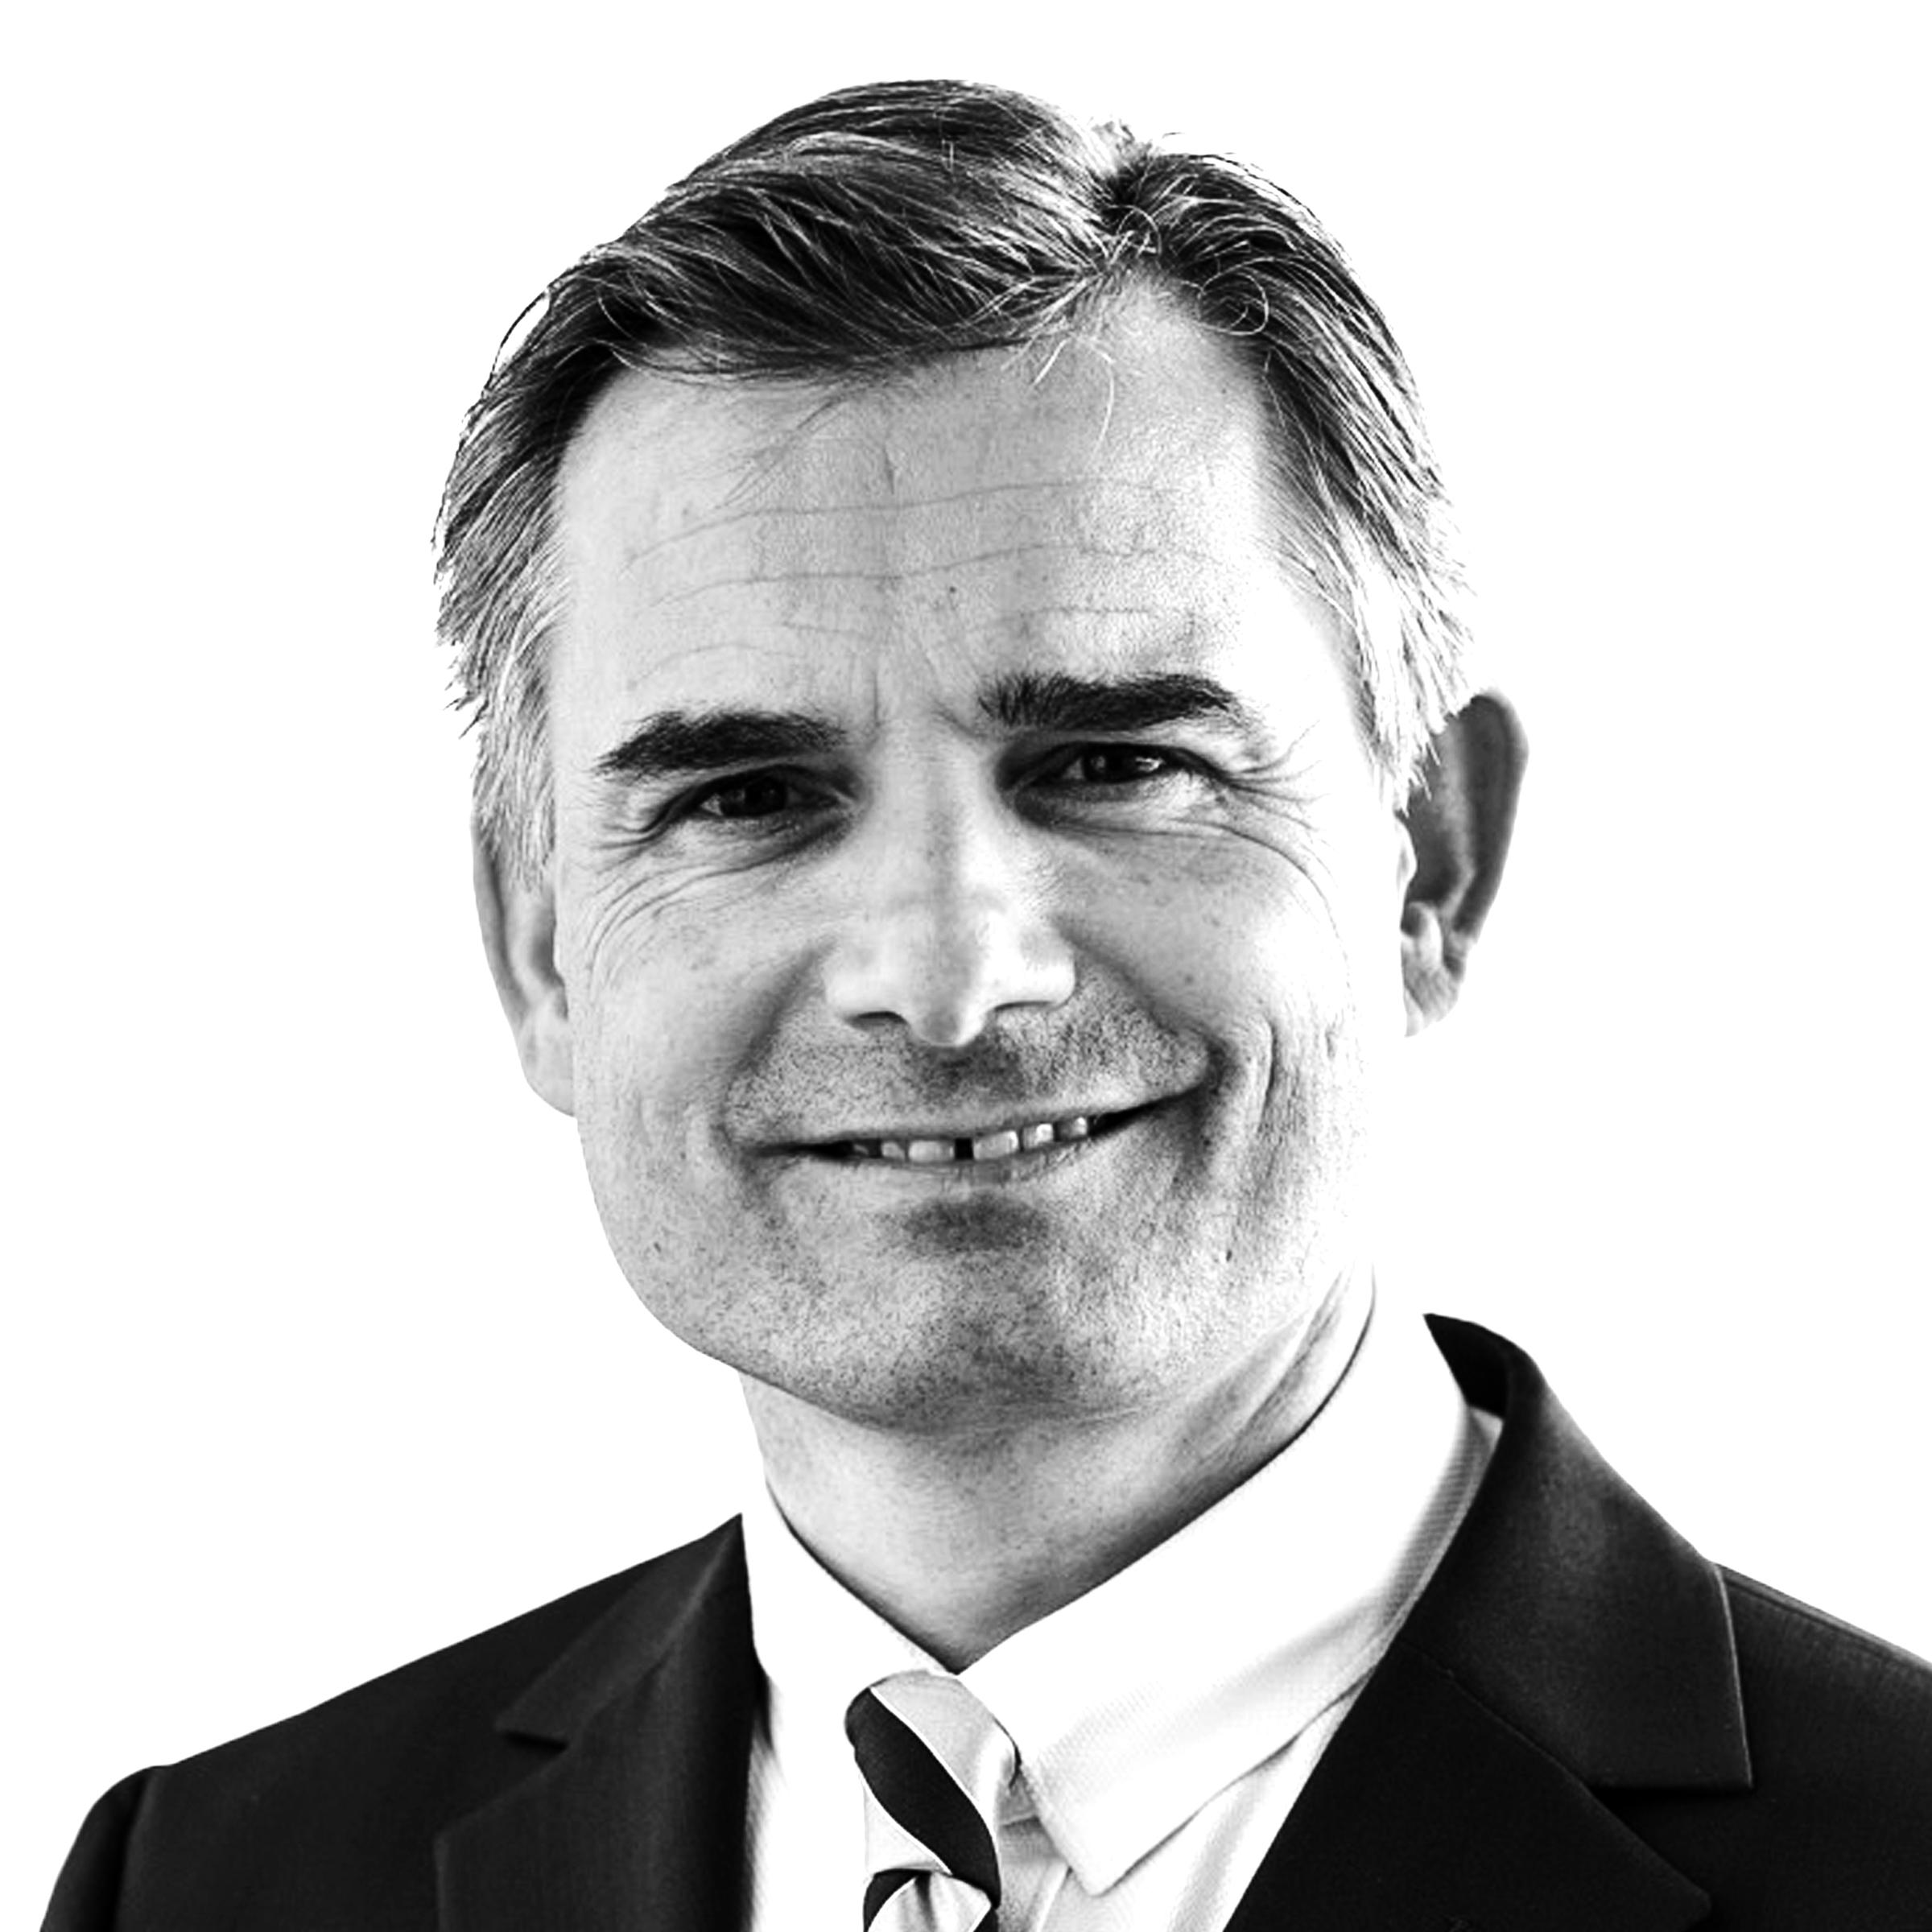 Siegbert Witkowski